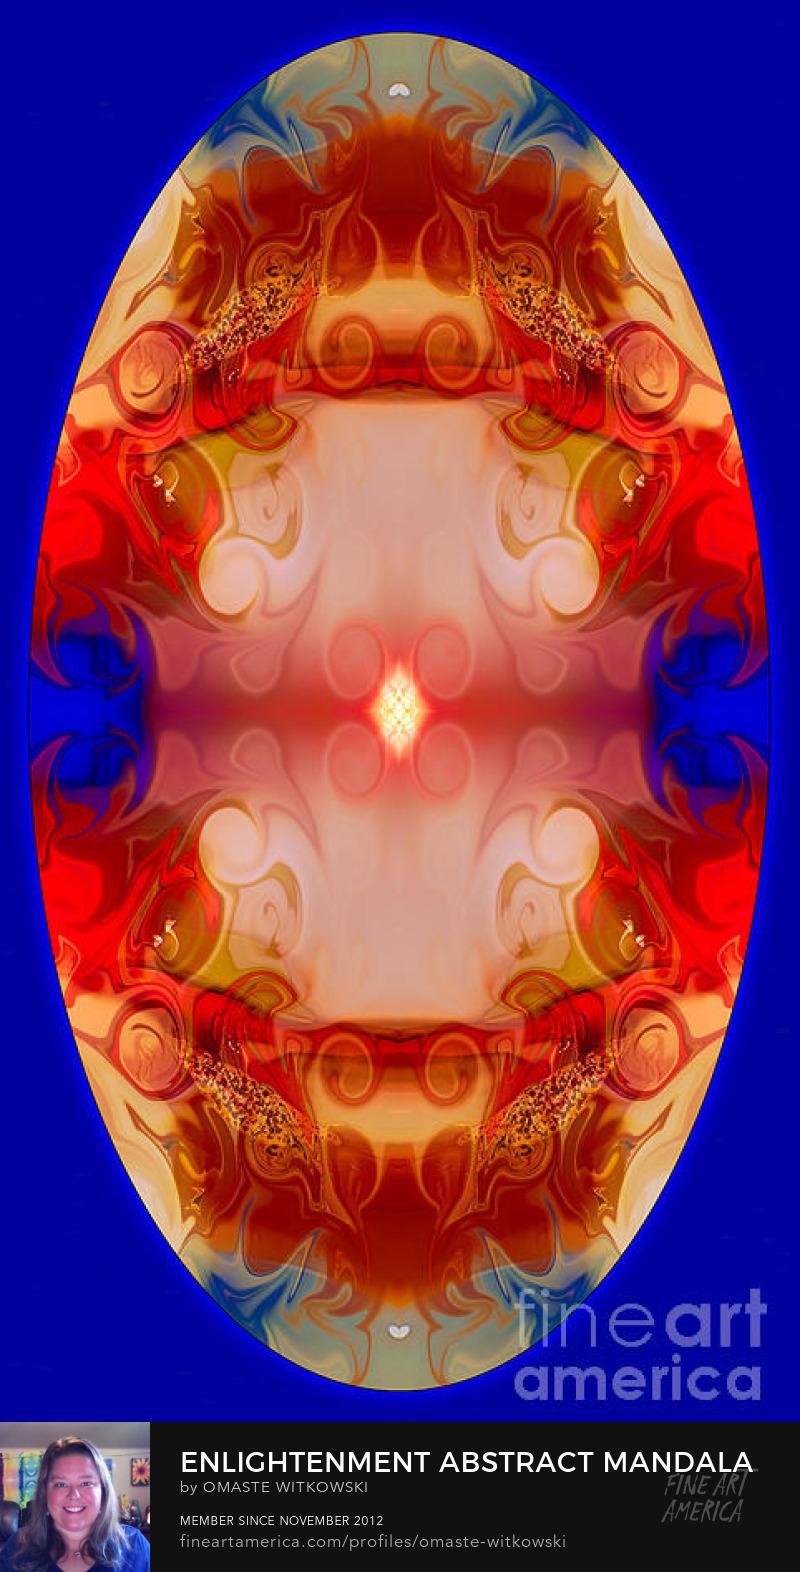 Enlightenment Abstract Mandala Artwork Wheels Of Enlightenment Art Prints